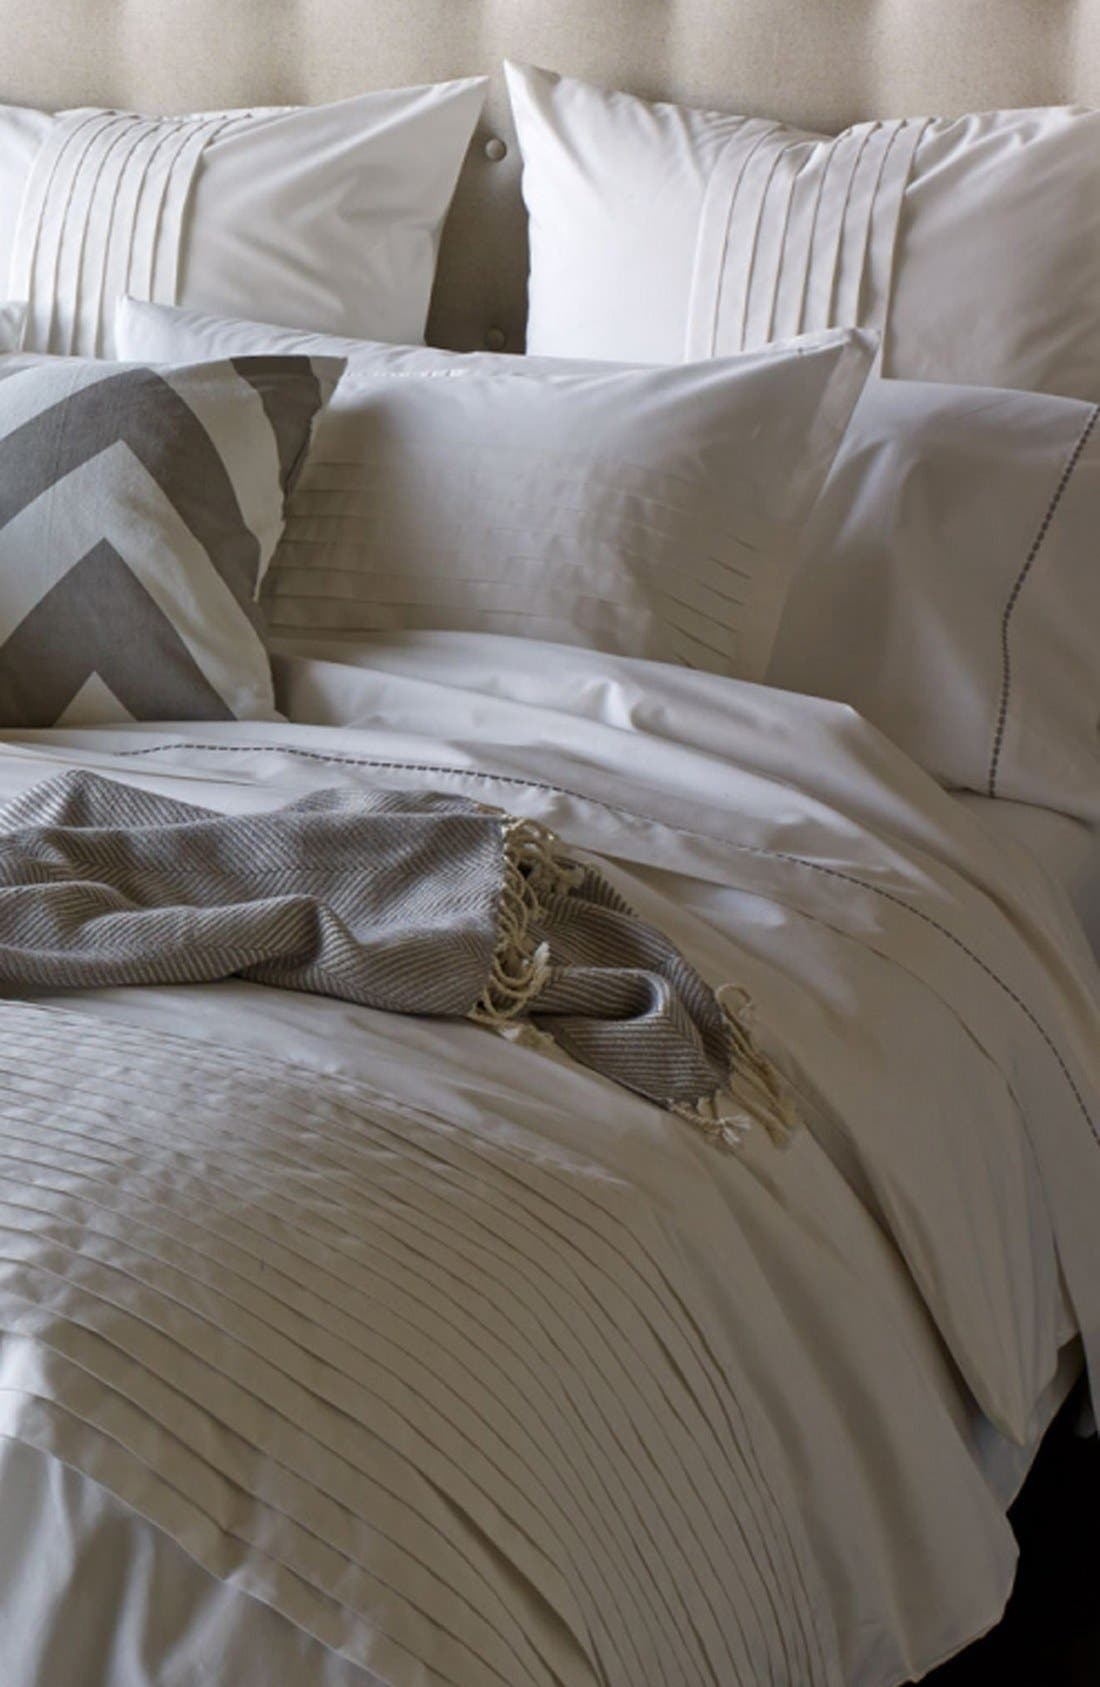 Main Image - zestt 'Block Island' 200 Thread Count Organic Cotton Duvet Cover